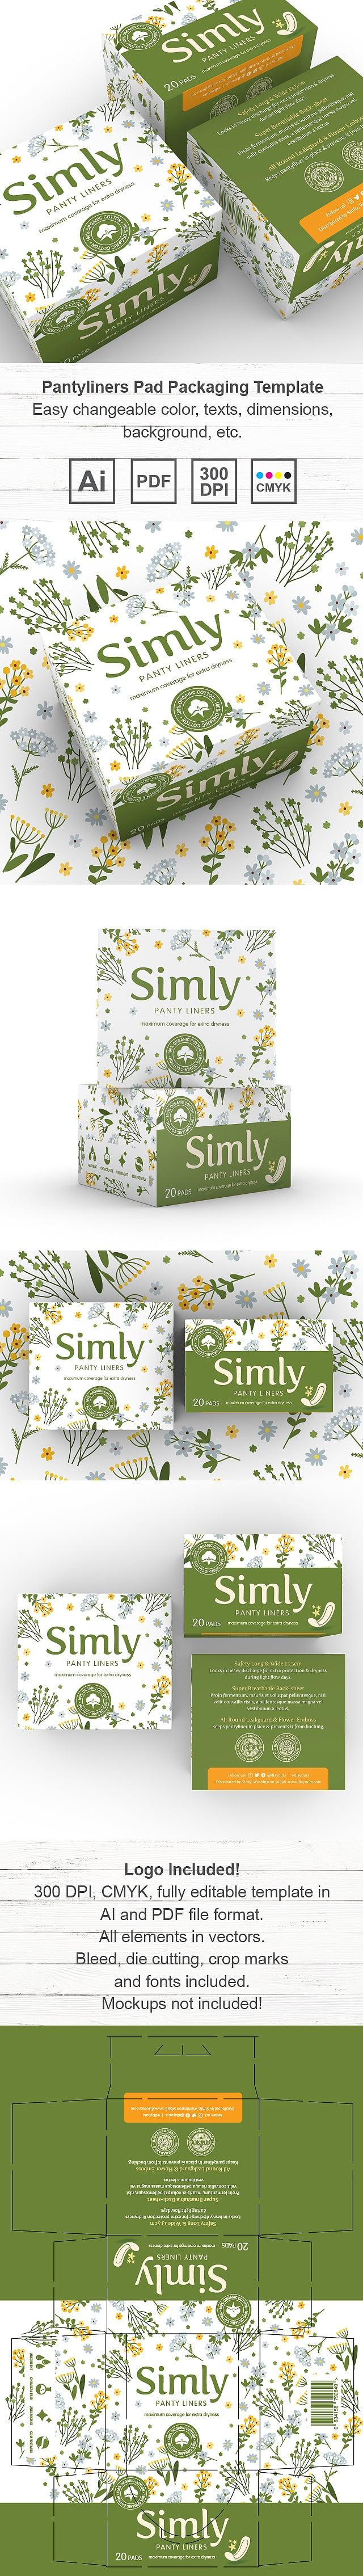 Pantyliners Pad Packaging Template